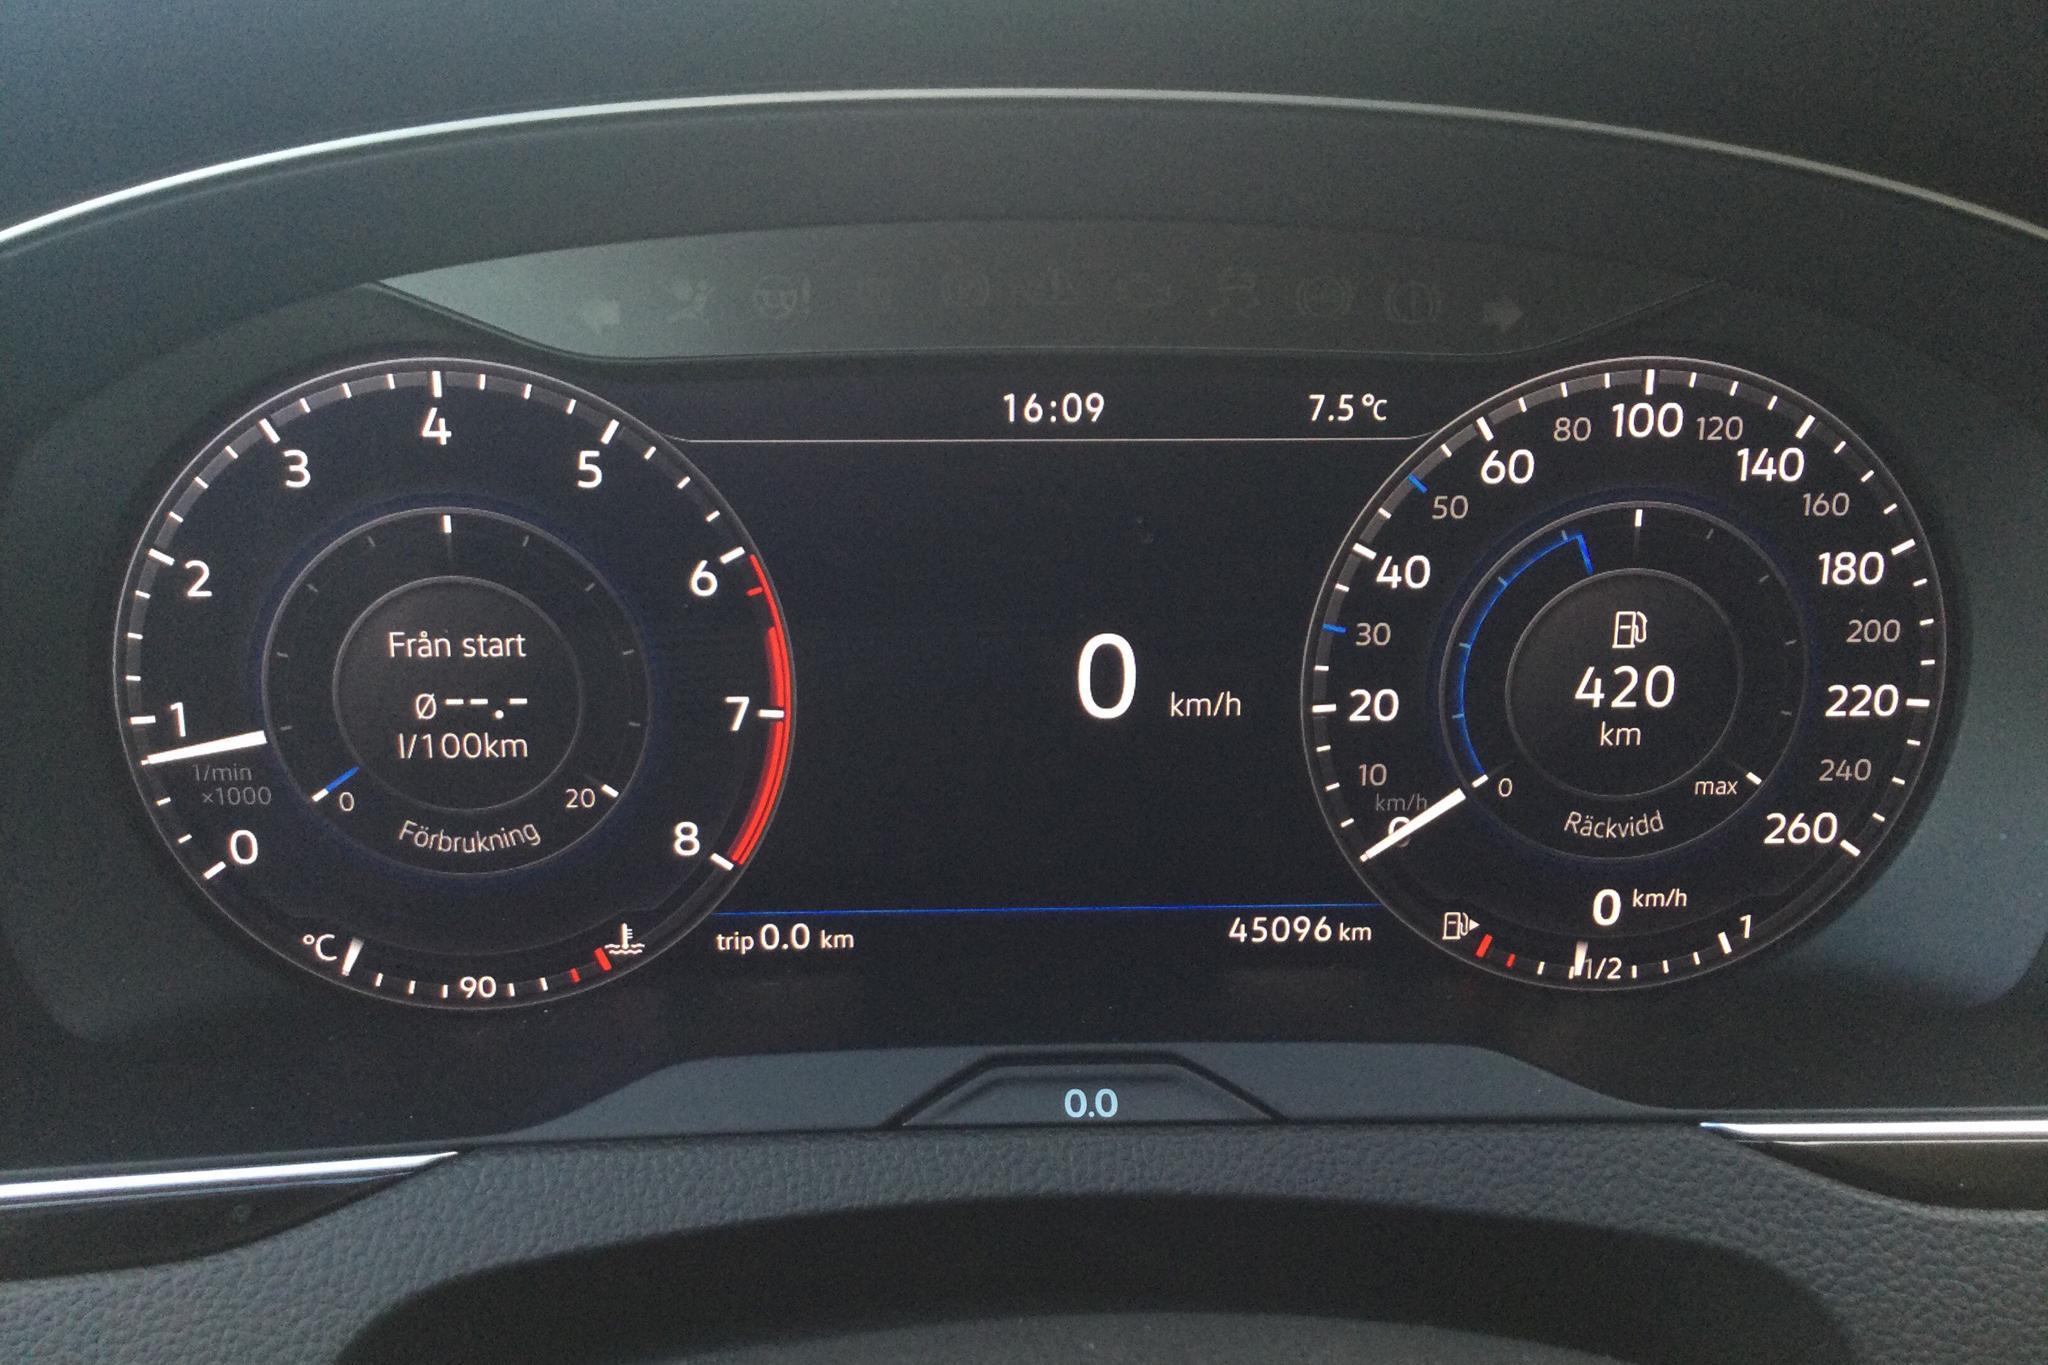 VW Passat 1.4 TSI Sportscombi (150hk) - 45 090 km - Manual - white - 2018